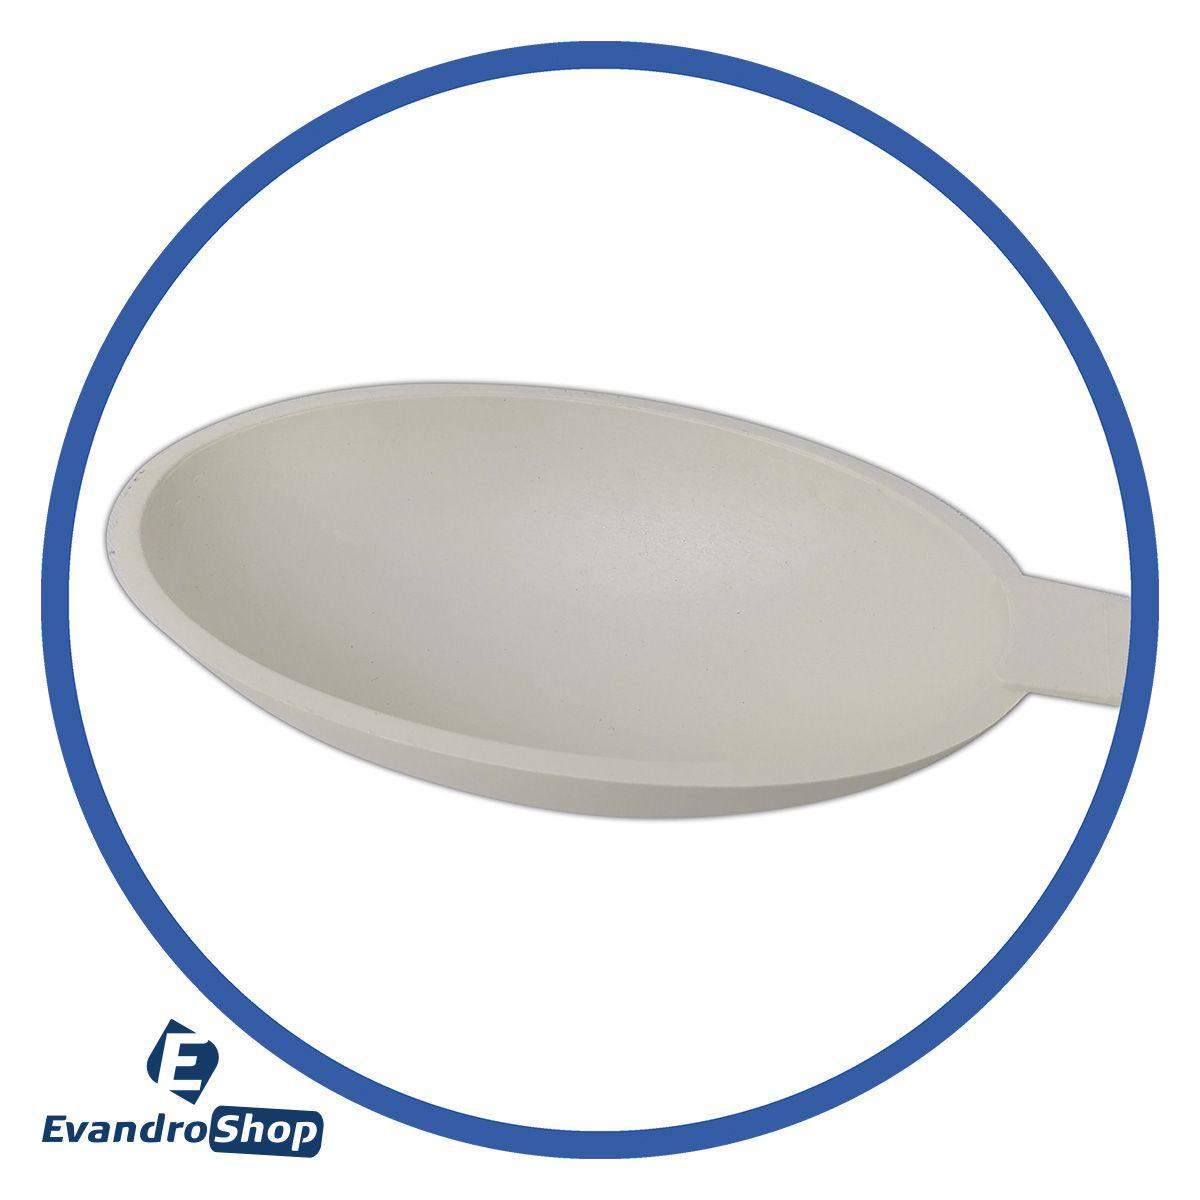 Colher Em Nylon Concova Funda Branca 60x10 Cm - Solrac